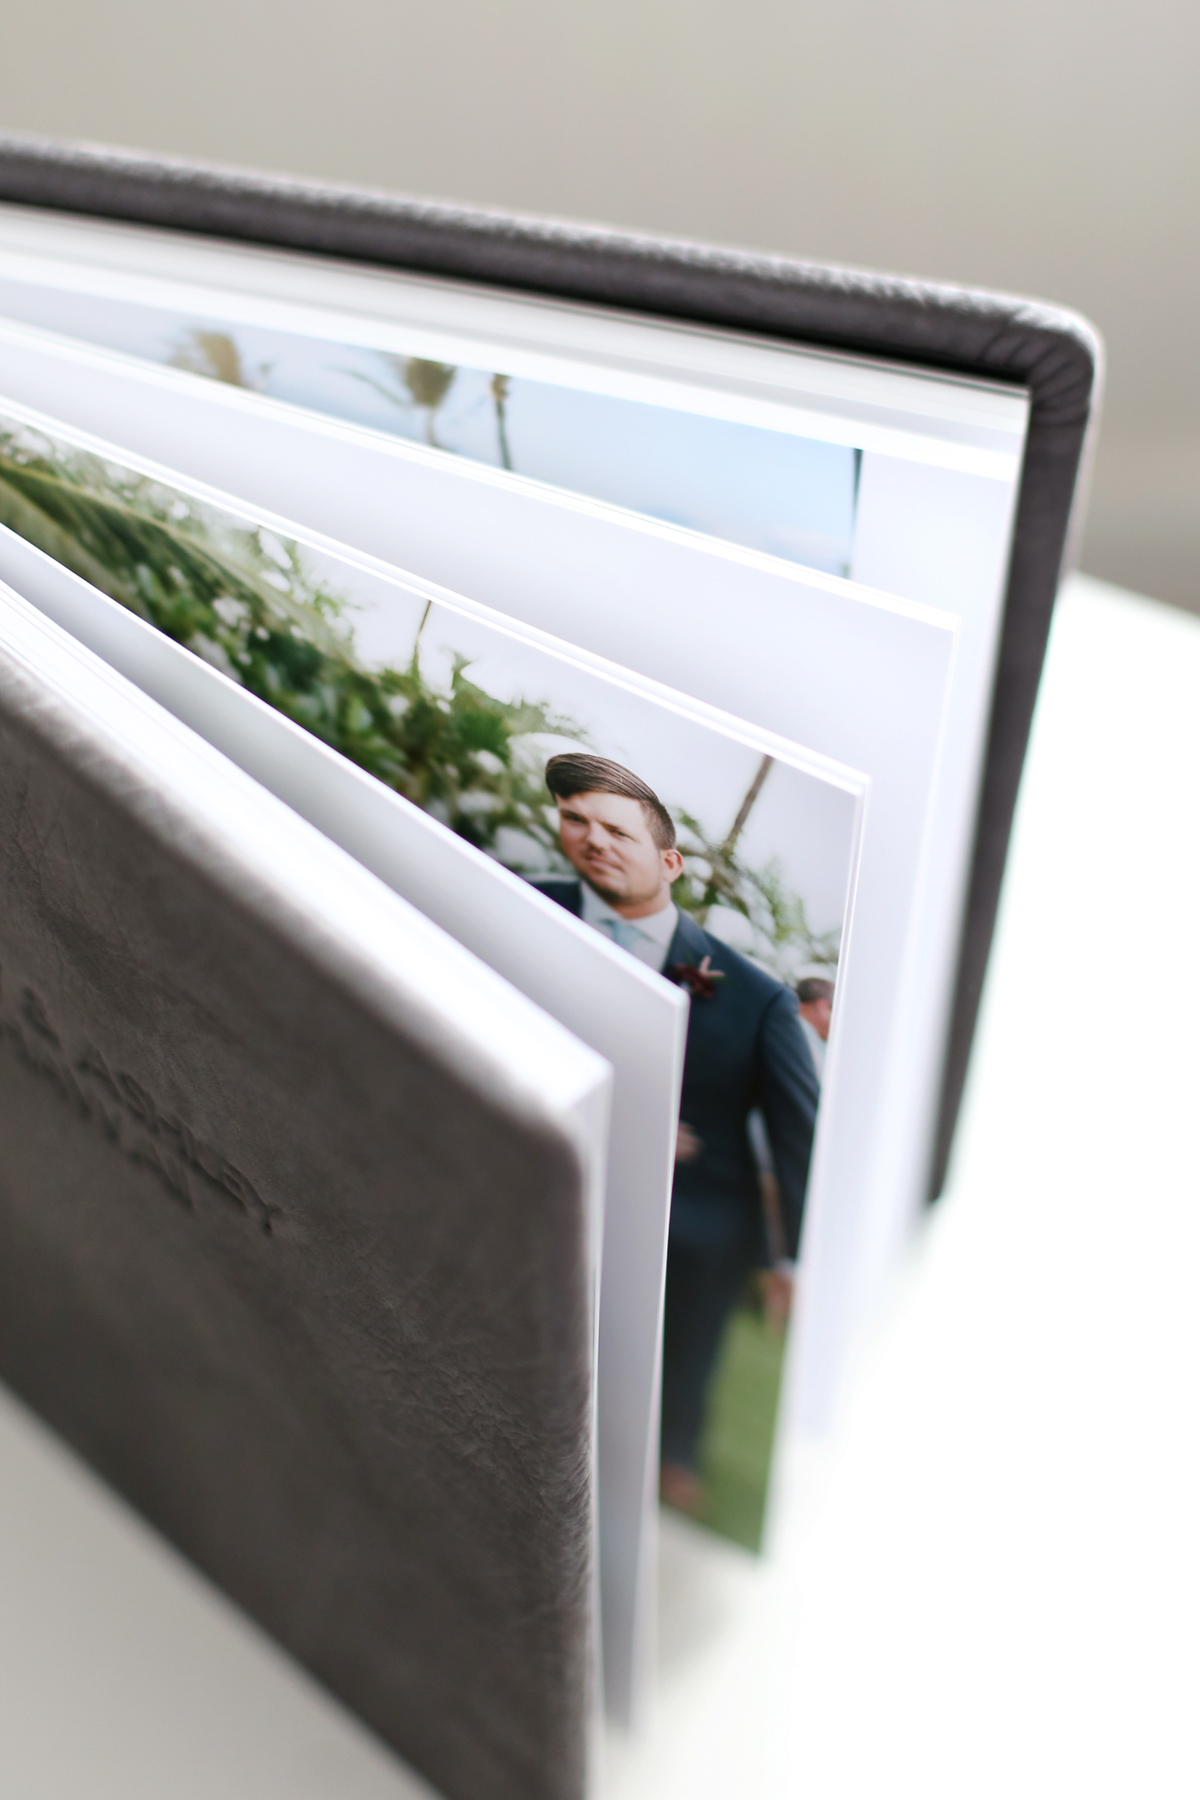 wedding-photographer-offering-albums-prints-nashville06.JPG